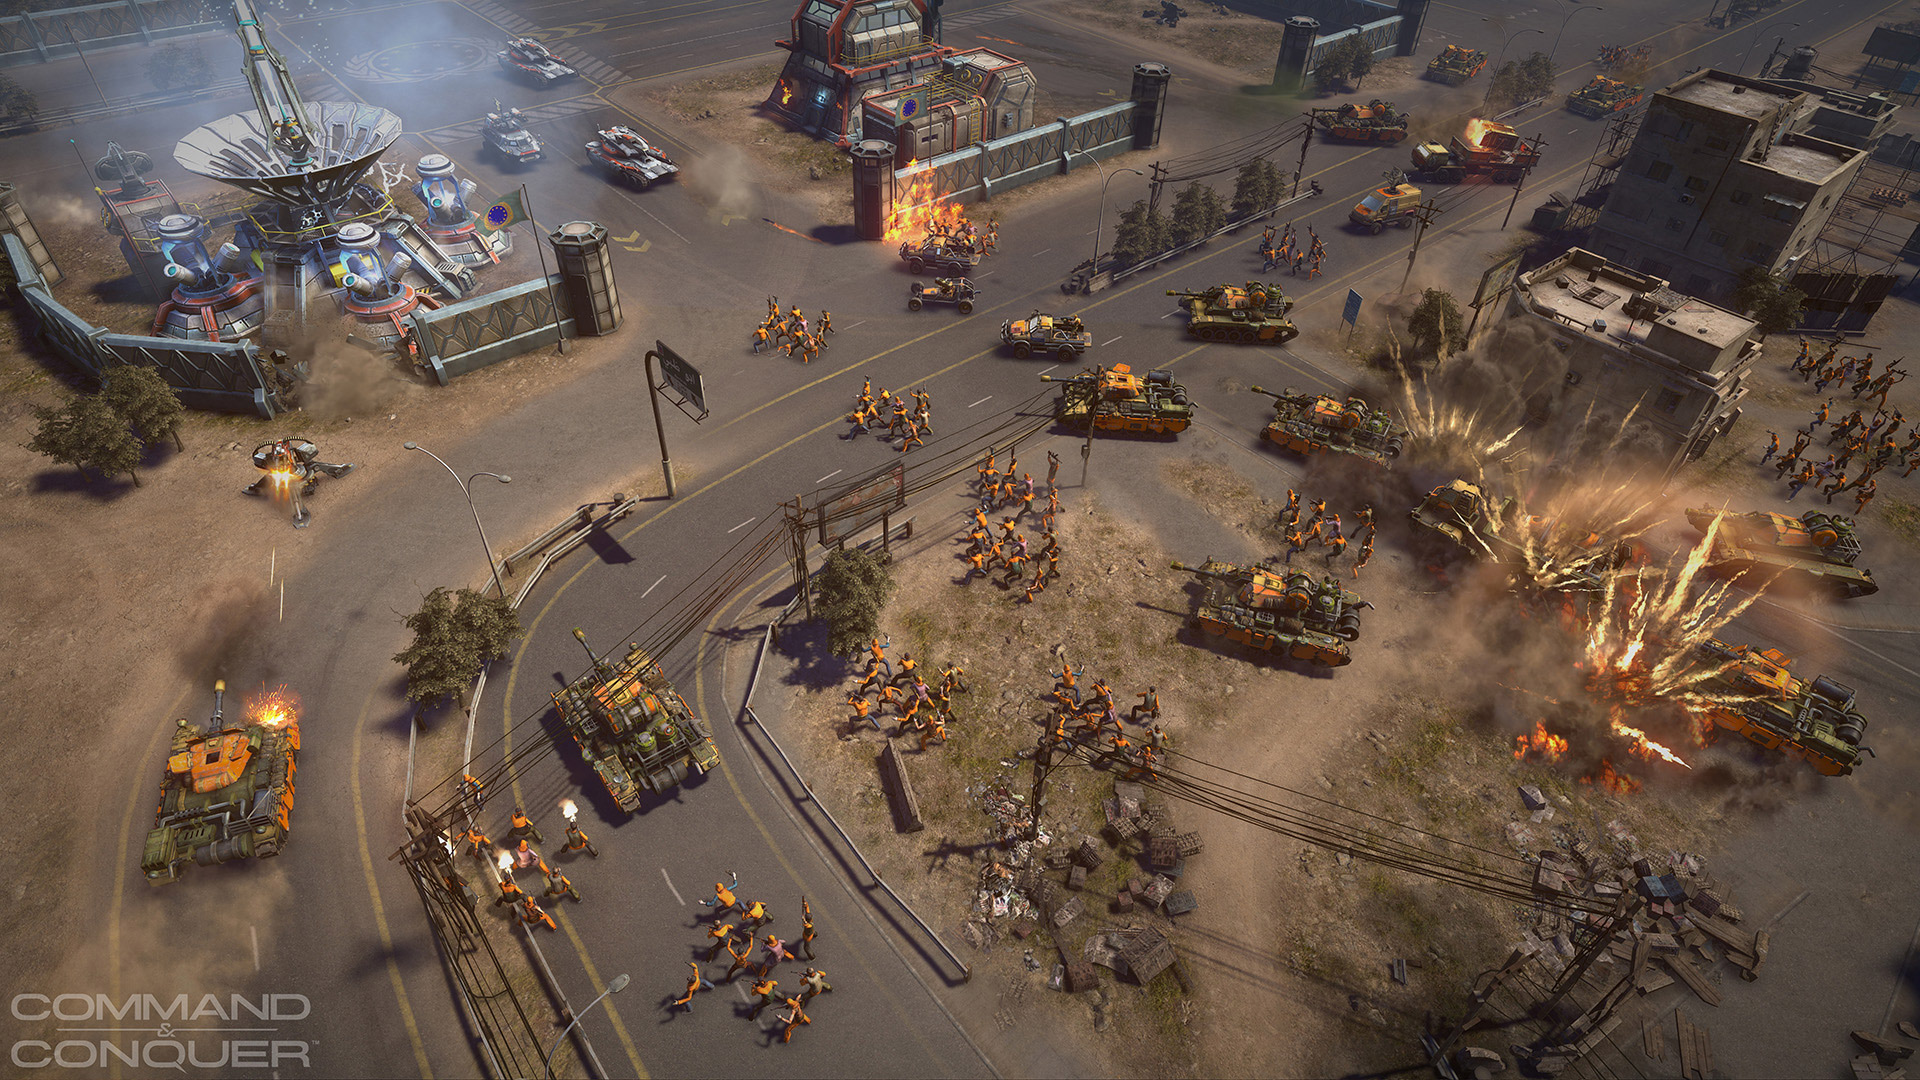 Command Conquer: Tiberian Sun Patch